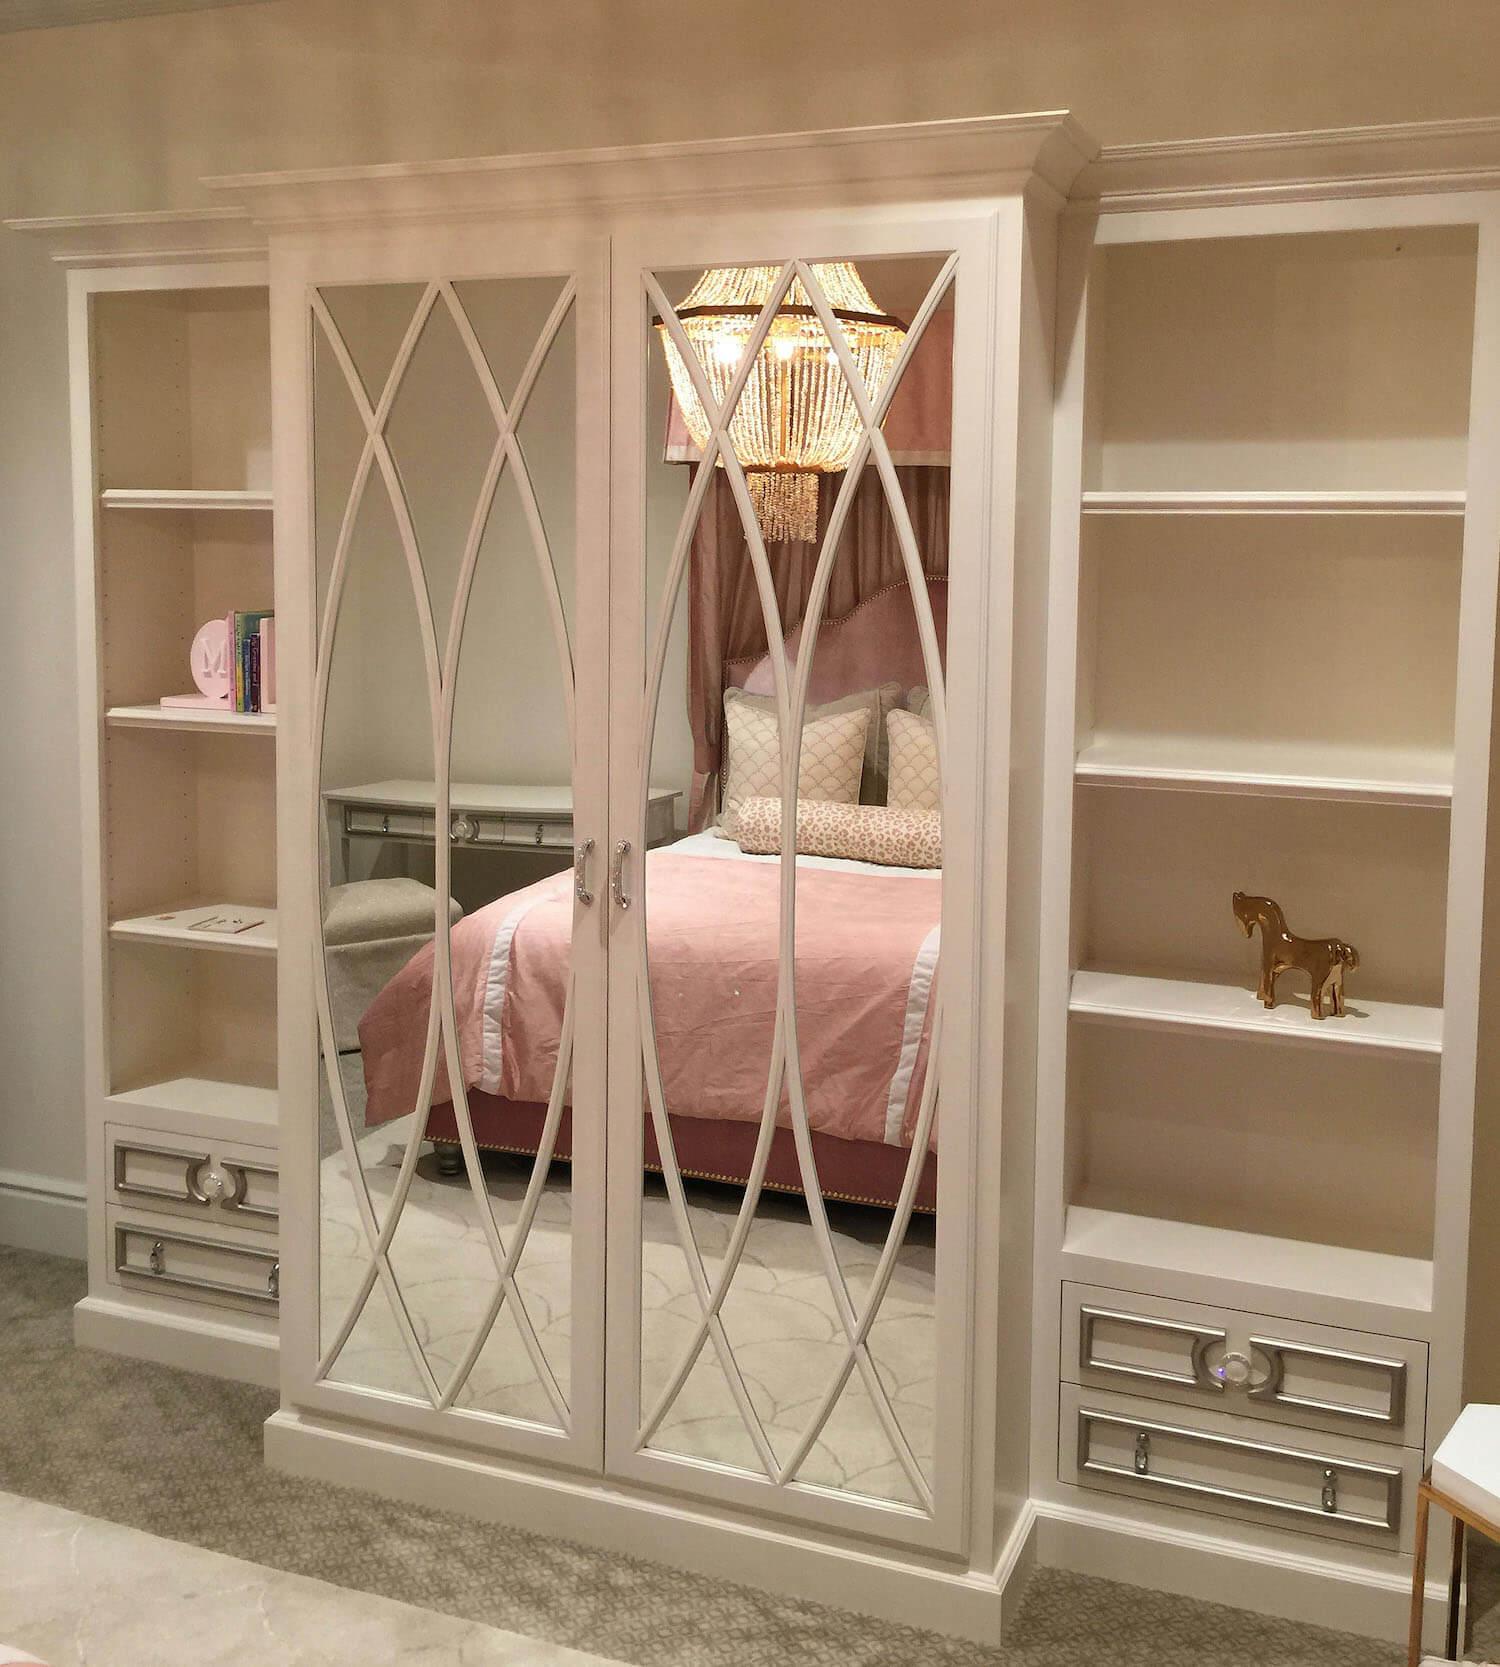 Brilliant Round Furniture Or Cabinet Handle